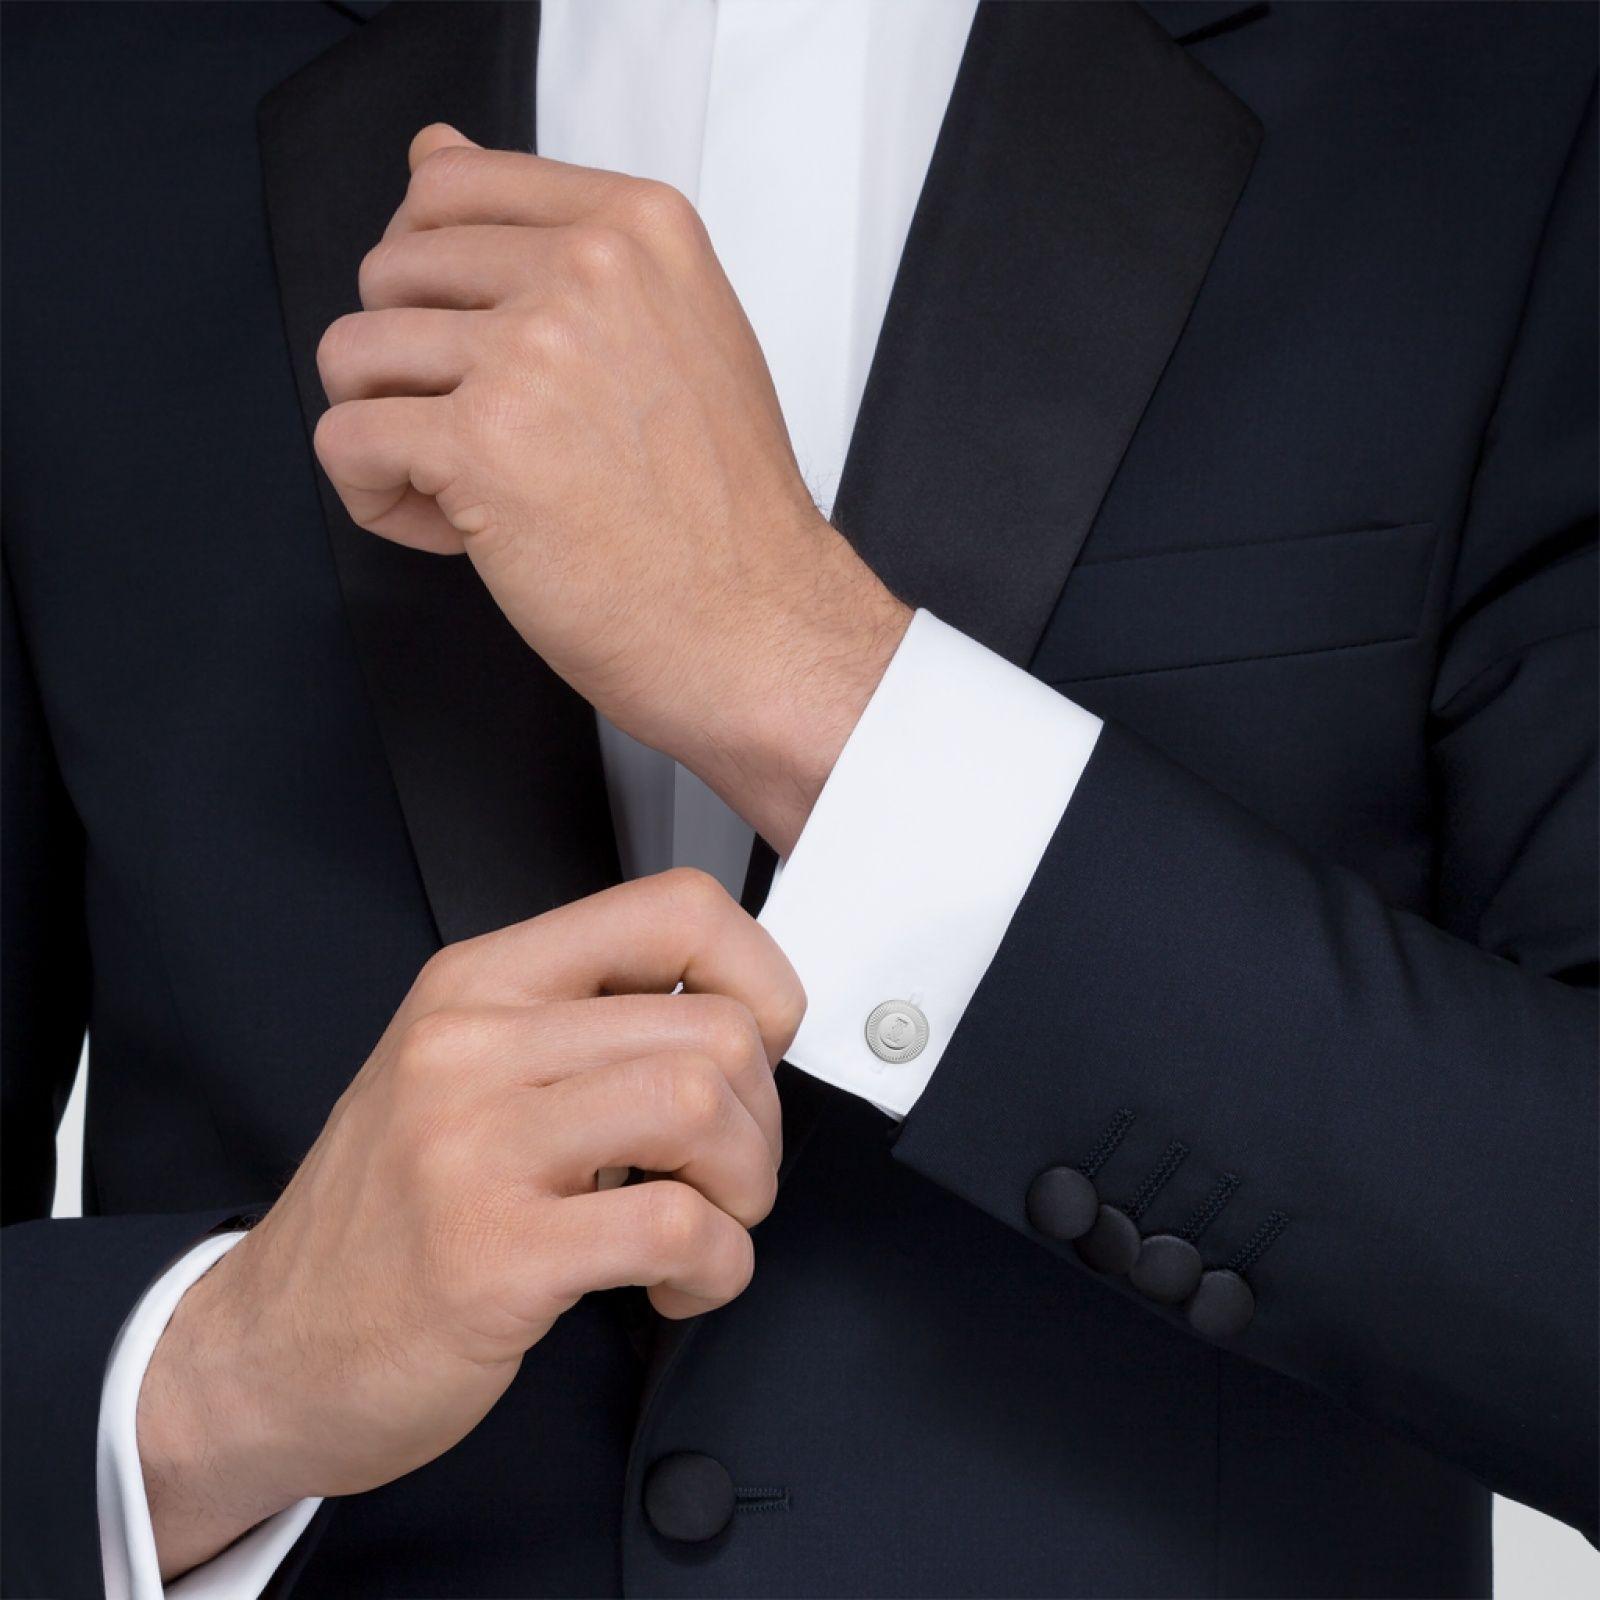 Crog000169 C De Cartier Cufflinks Sterling Silver Palladium Finish Cartier Cufflinks Vintage Cufflinks Mens Accessories Jewelry